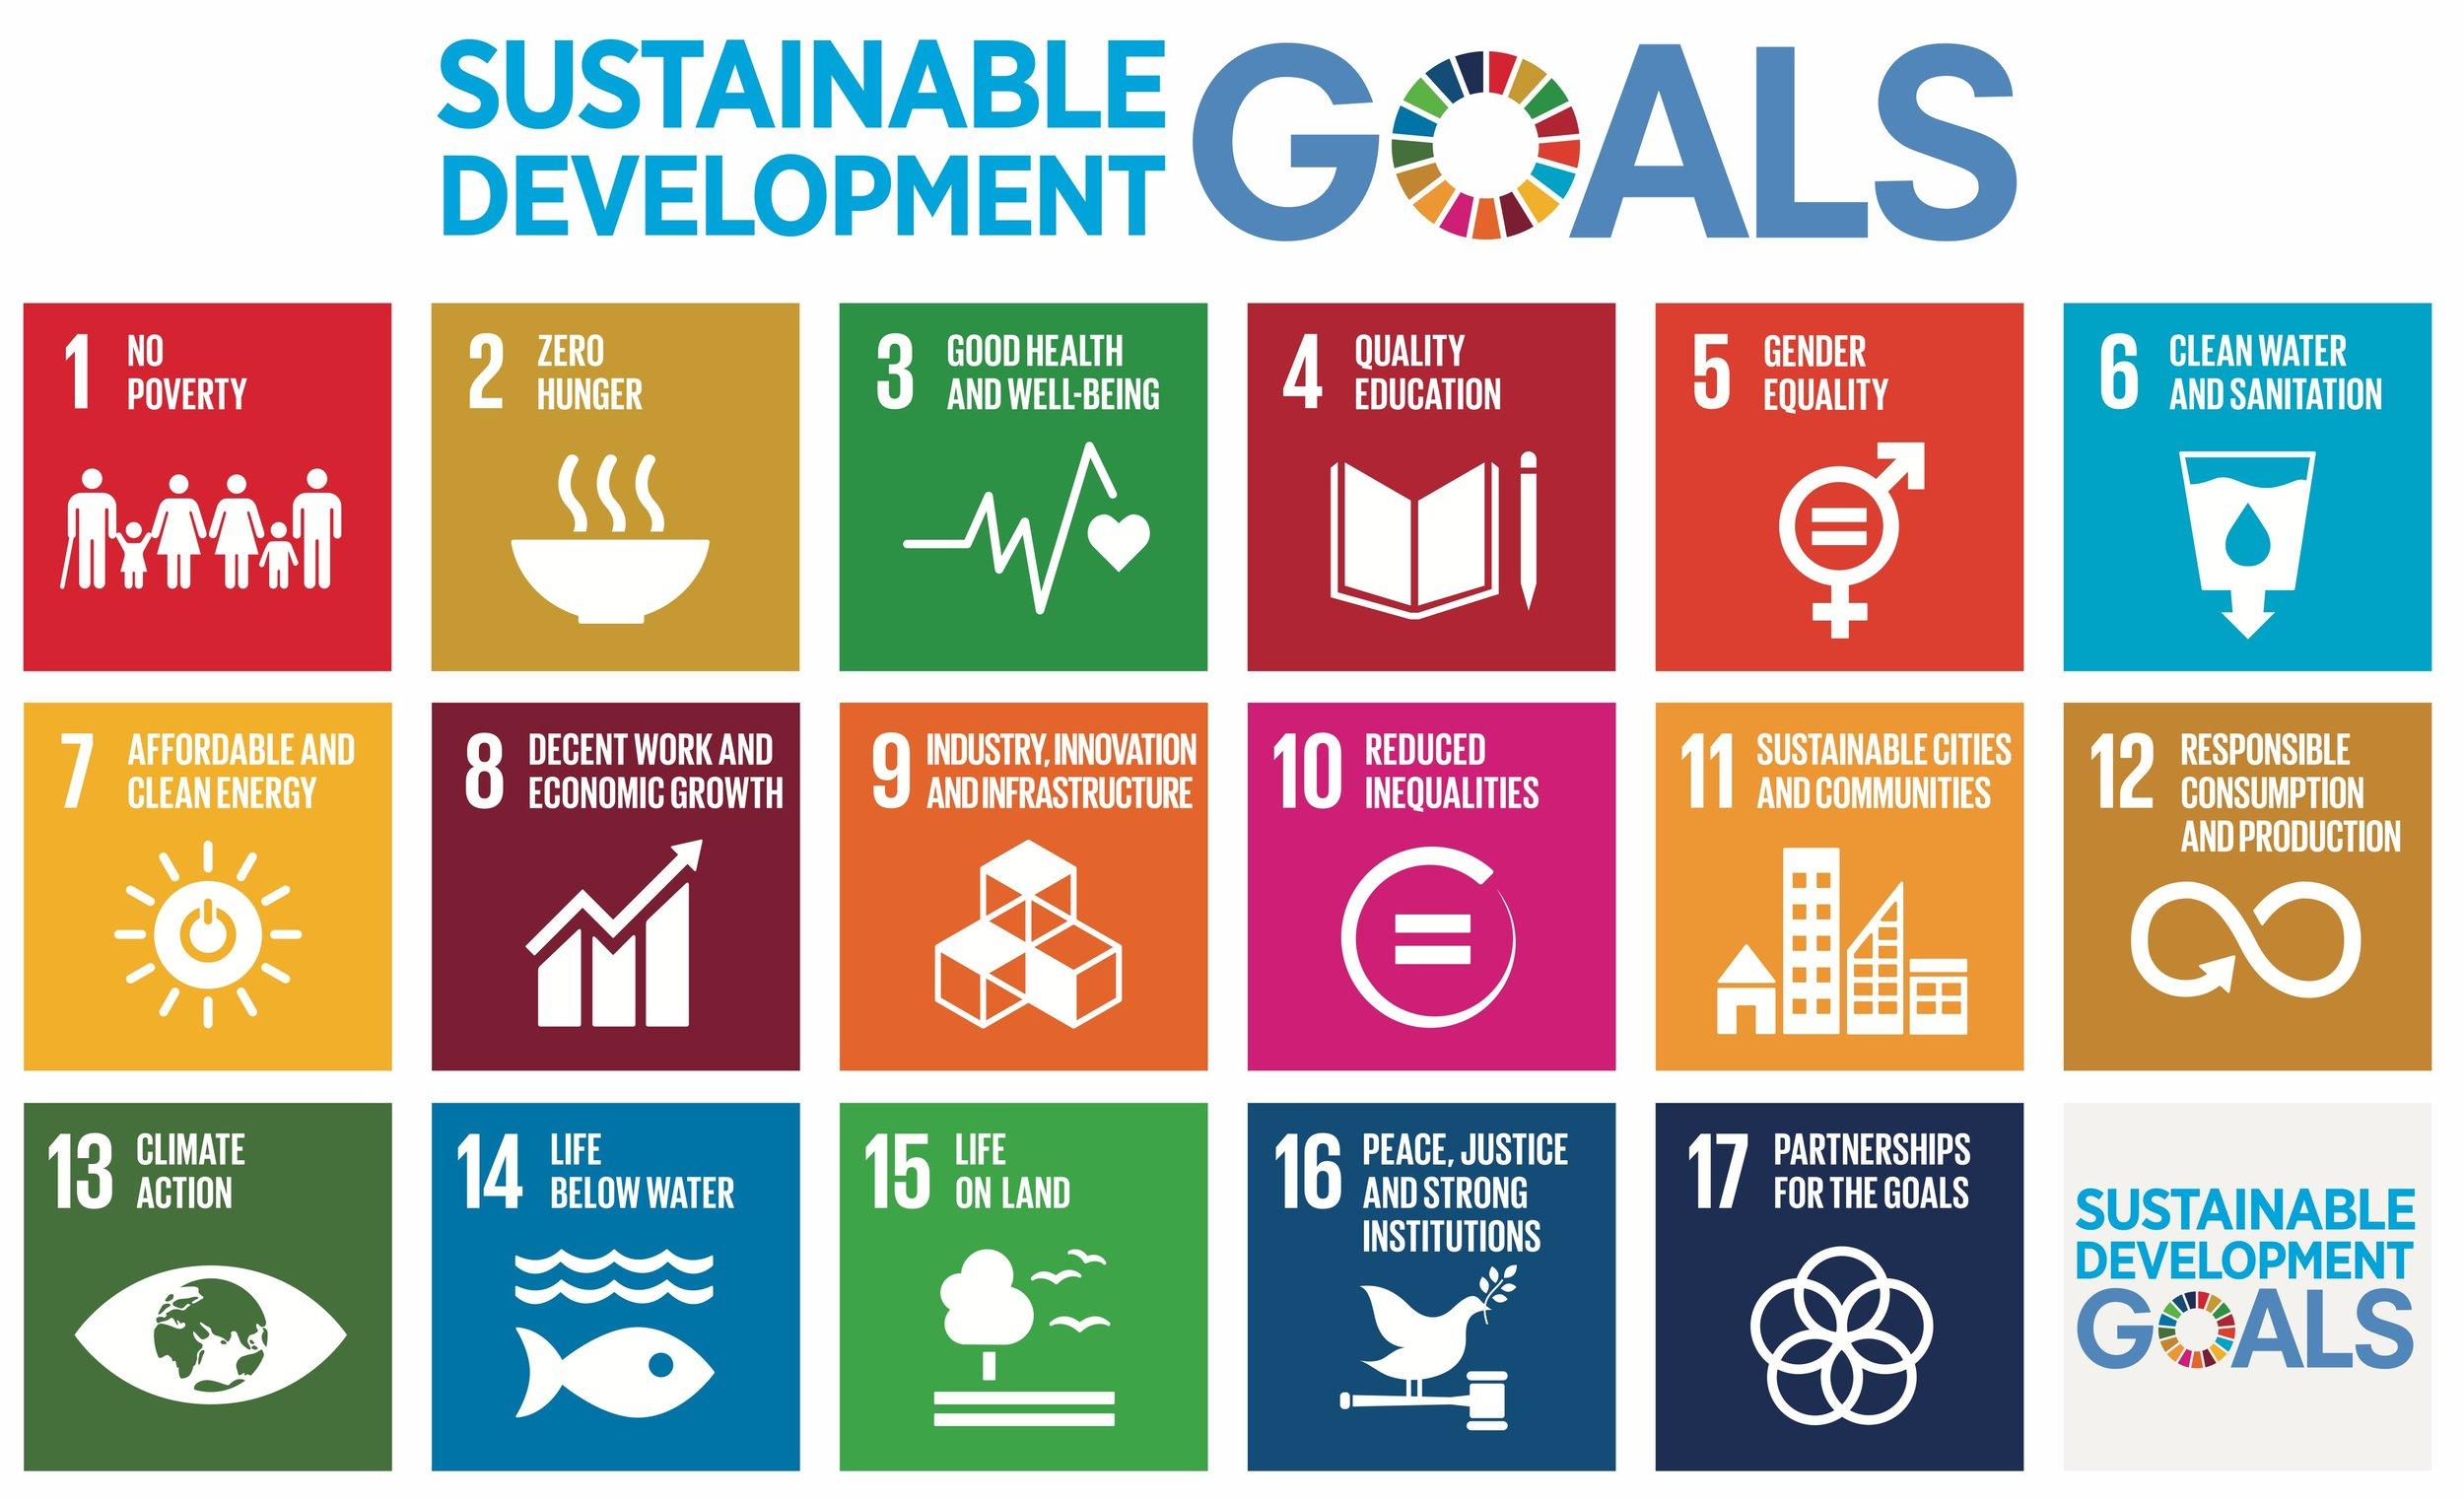 UN Sustainable Development Goals.jpg